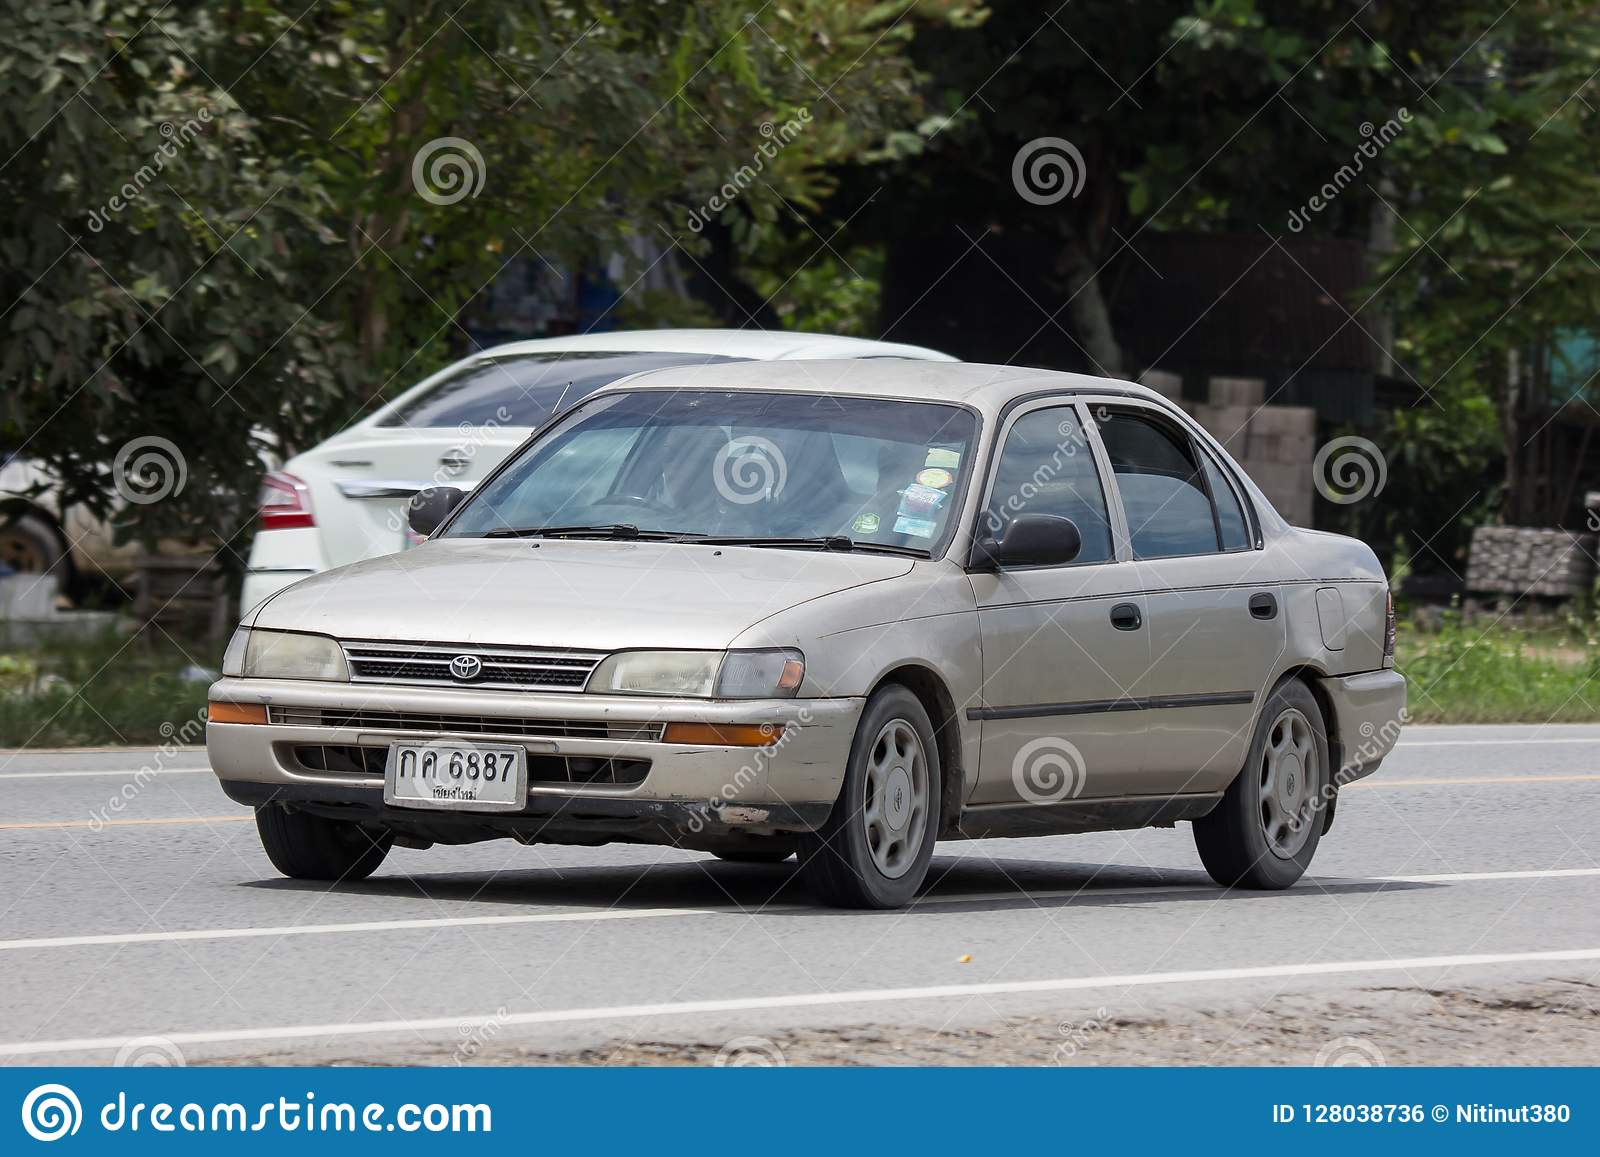 Privat gammal bil, Toyota Corolla